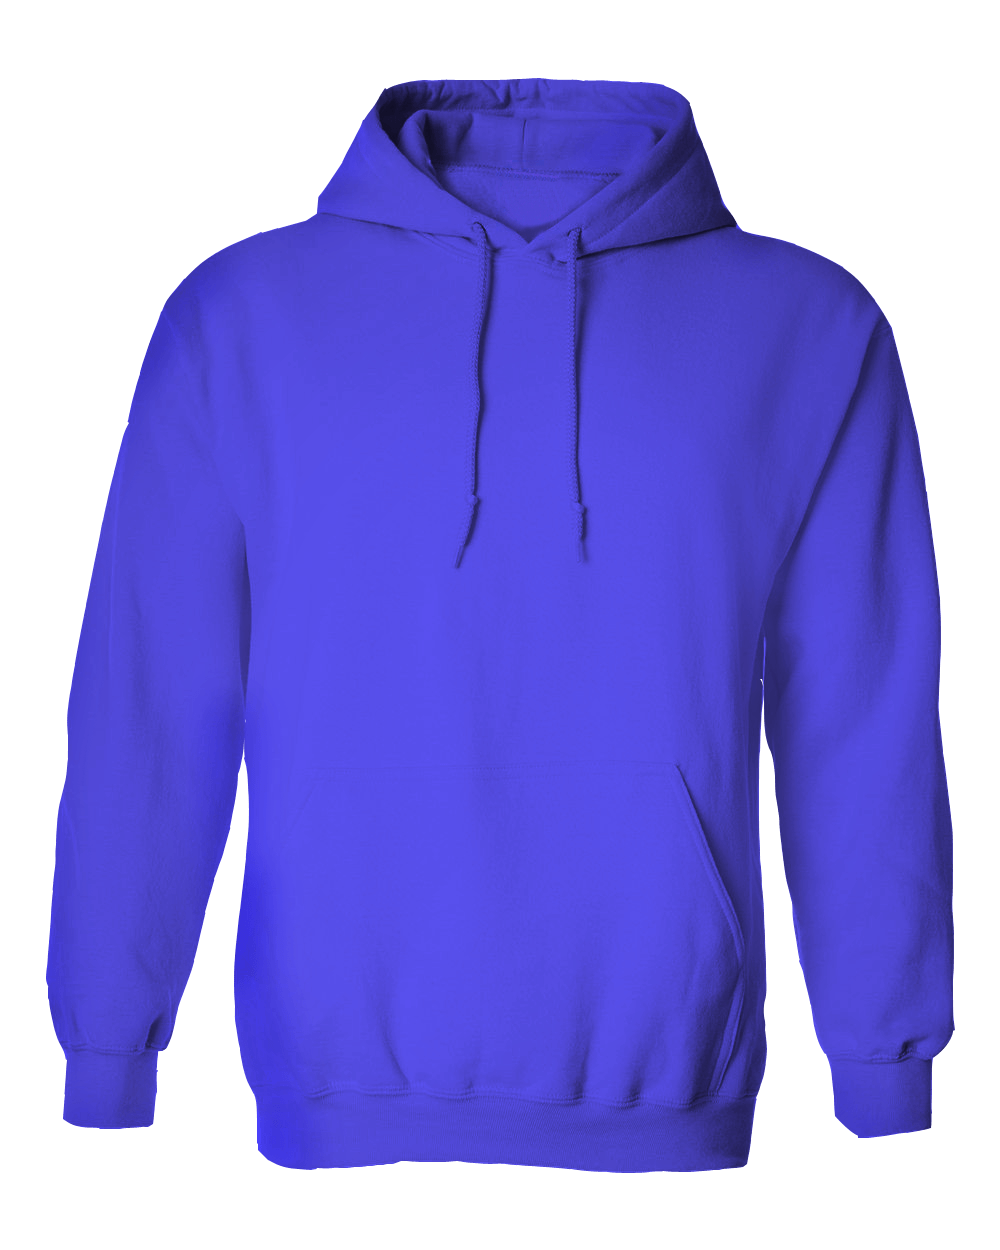 Royal Blue Hoodie Jacket without Zipper - Cutton Garments